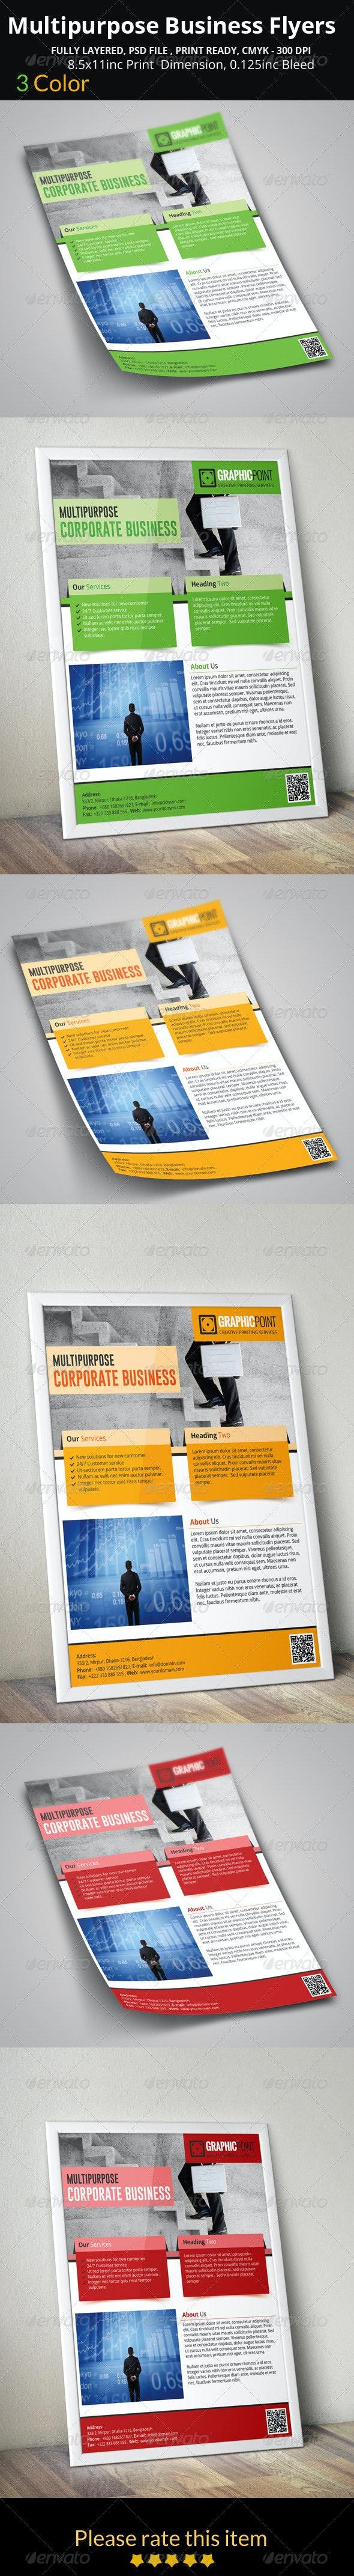 Multipurpose Business Flyers - Flyers Print Templates